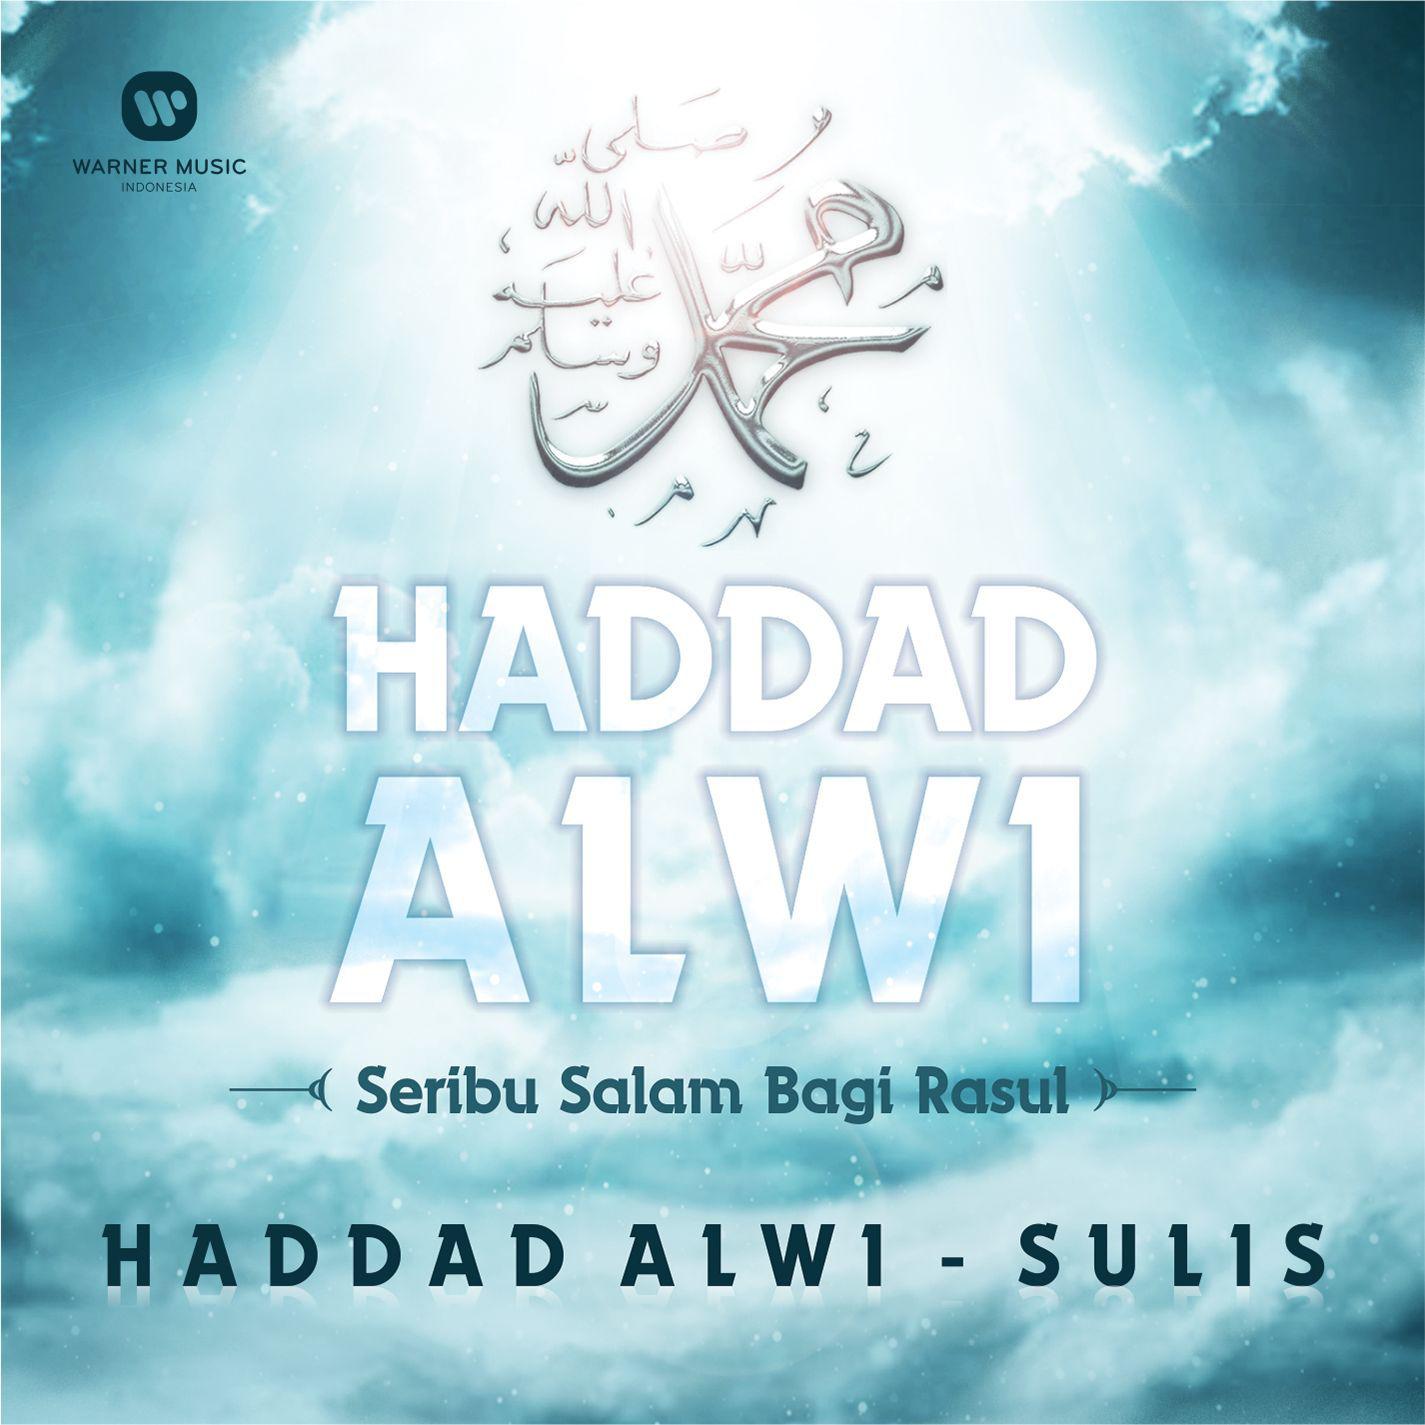 Haddad Alwi & Sulis - Seribu Salam Bagi Rasul - Album (2015) [iTunes Plus AAC M4A]